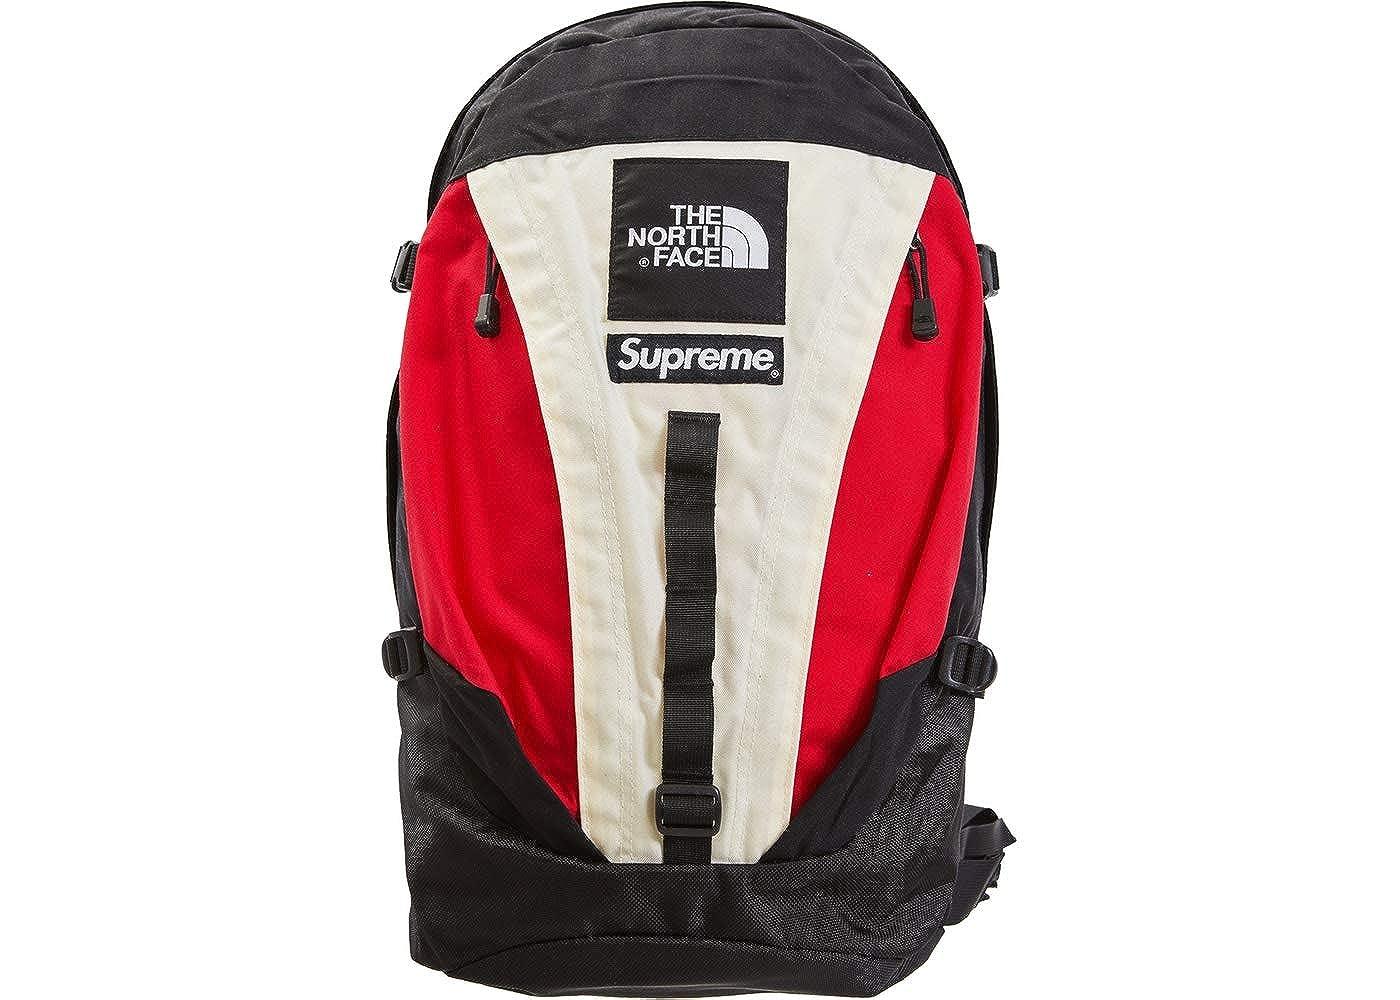 Supreme/North Face Expedition Backpack White 18FW シュプリーム/ノースフェイス エクスペディション バックパック (アメリカ正規並行輸入品) [並行輸入品]   B07NDQ15HP